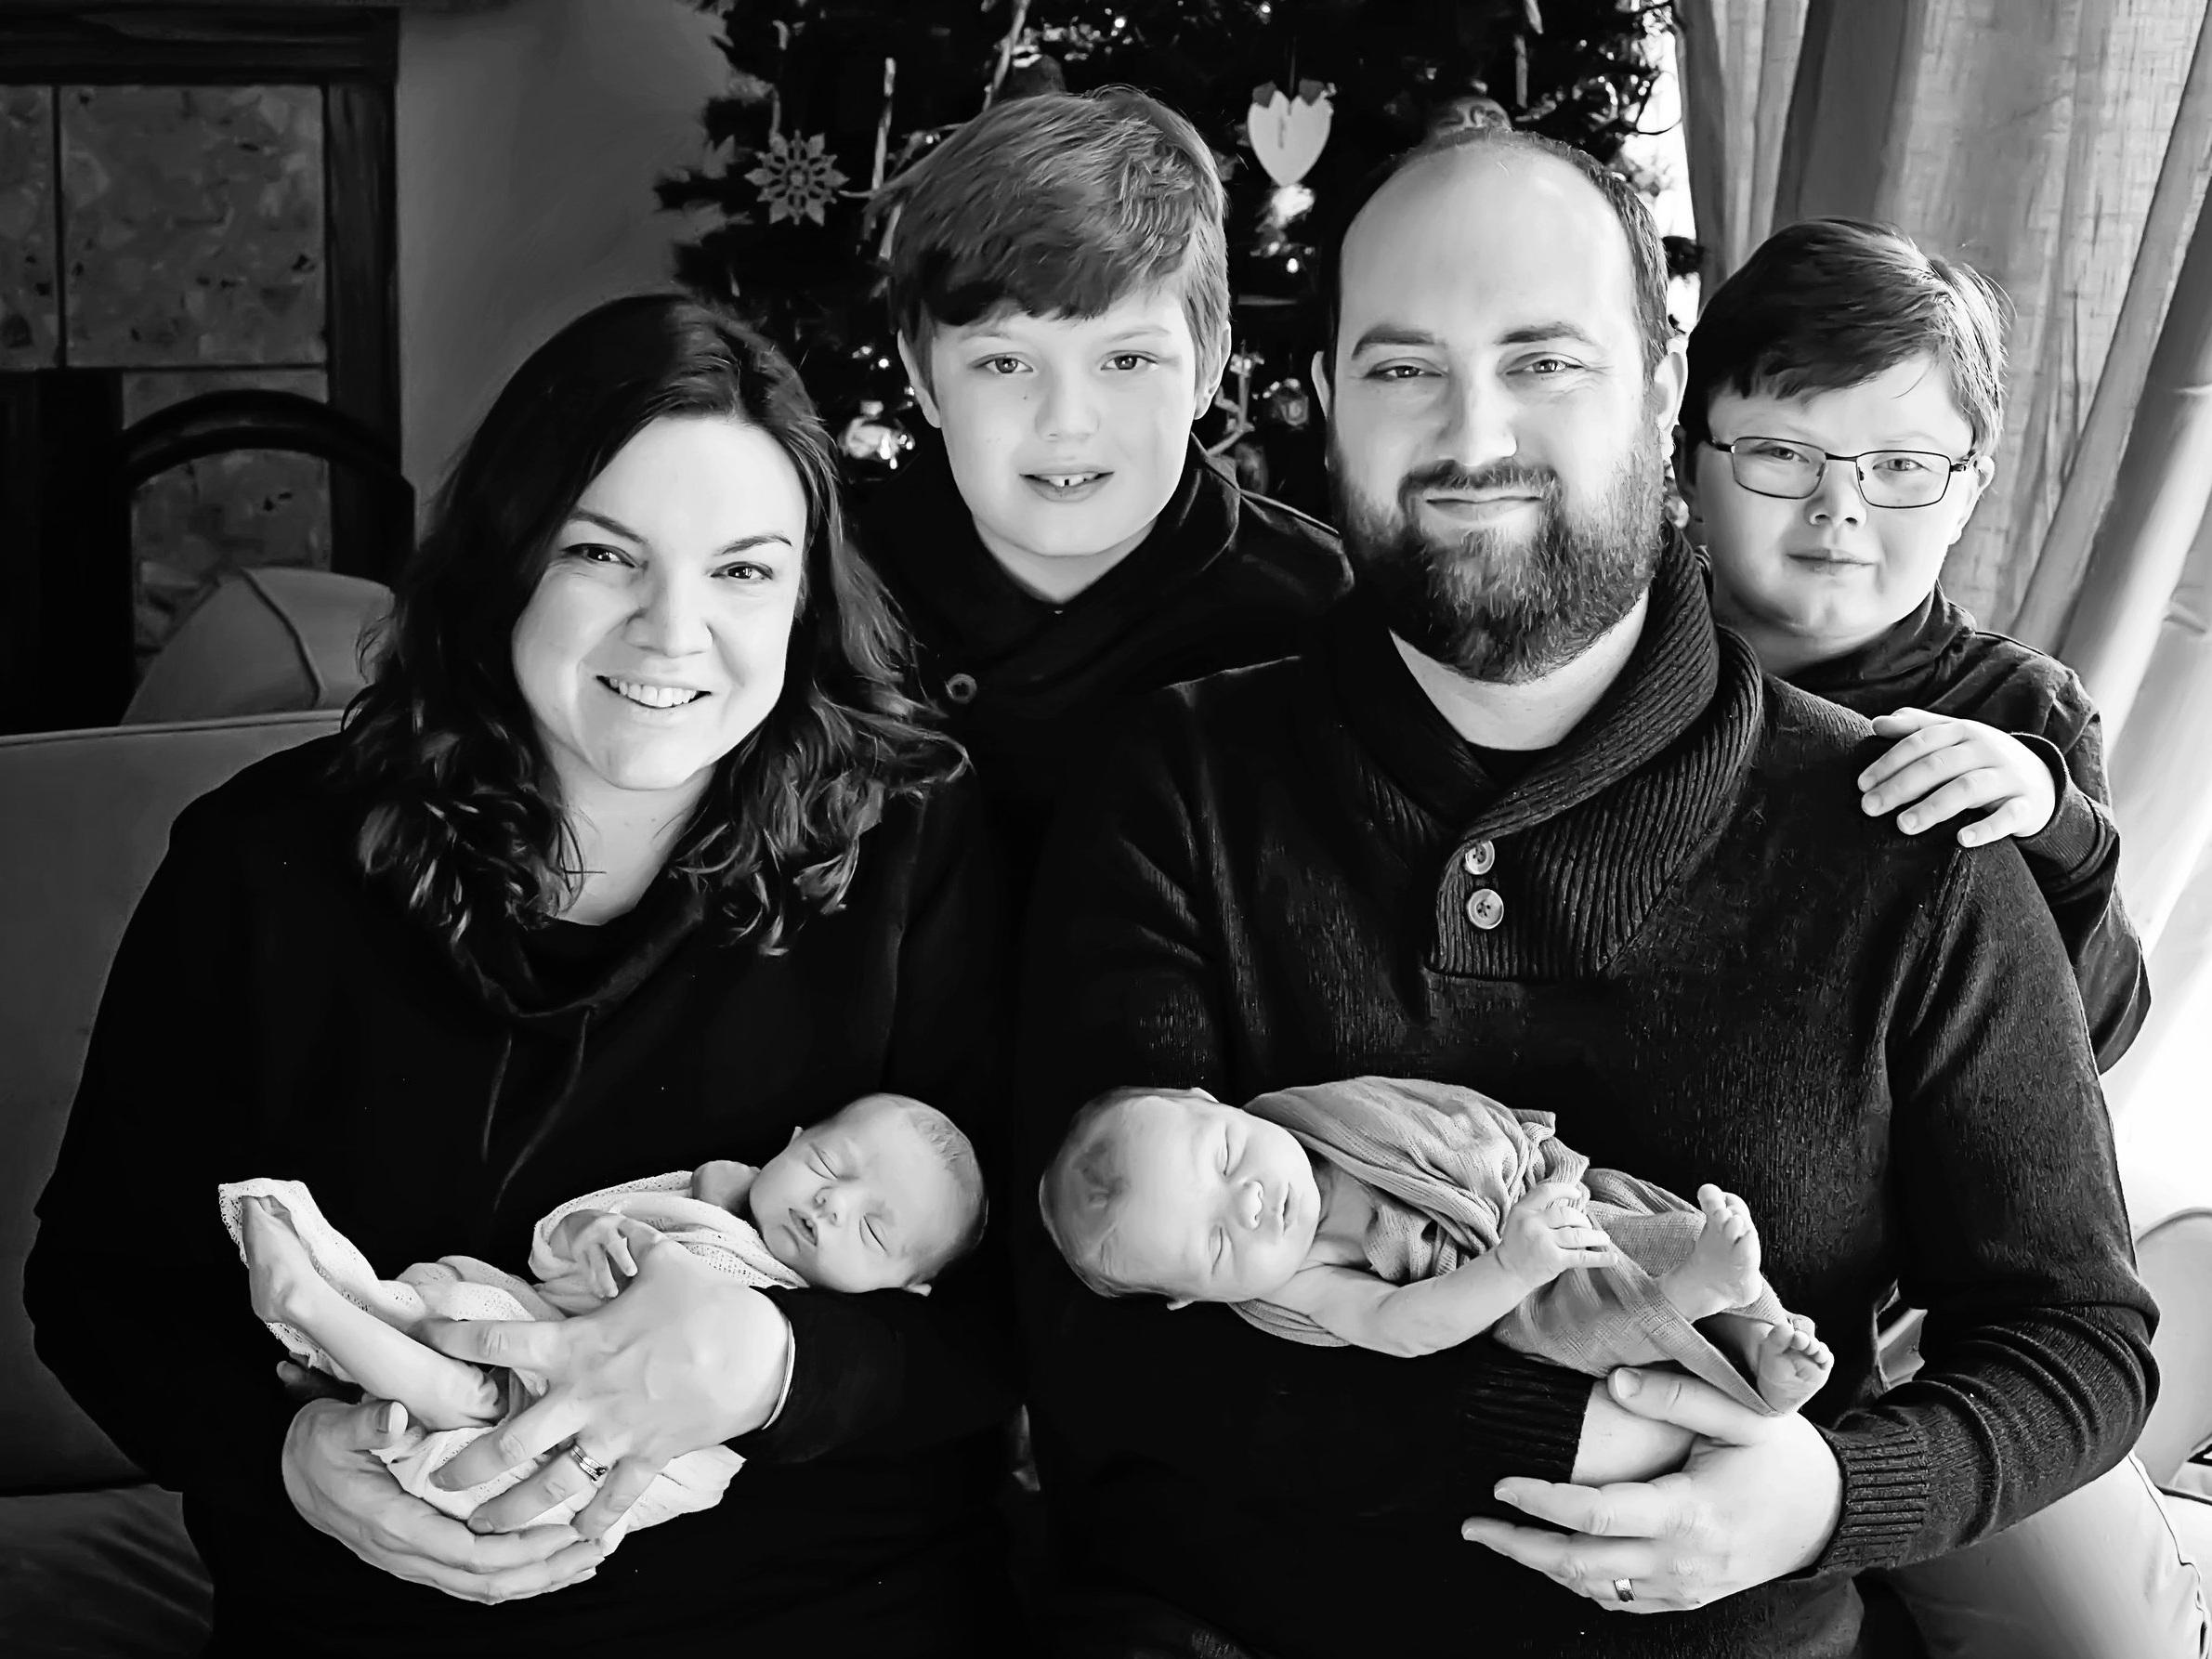 Ruland+Twins+Newborn-105+bw.jpg